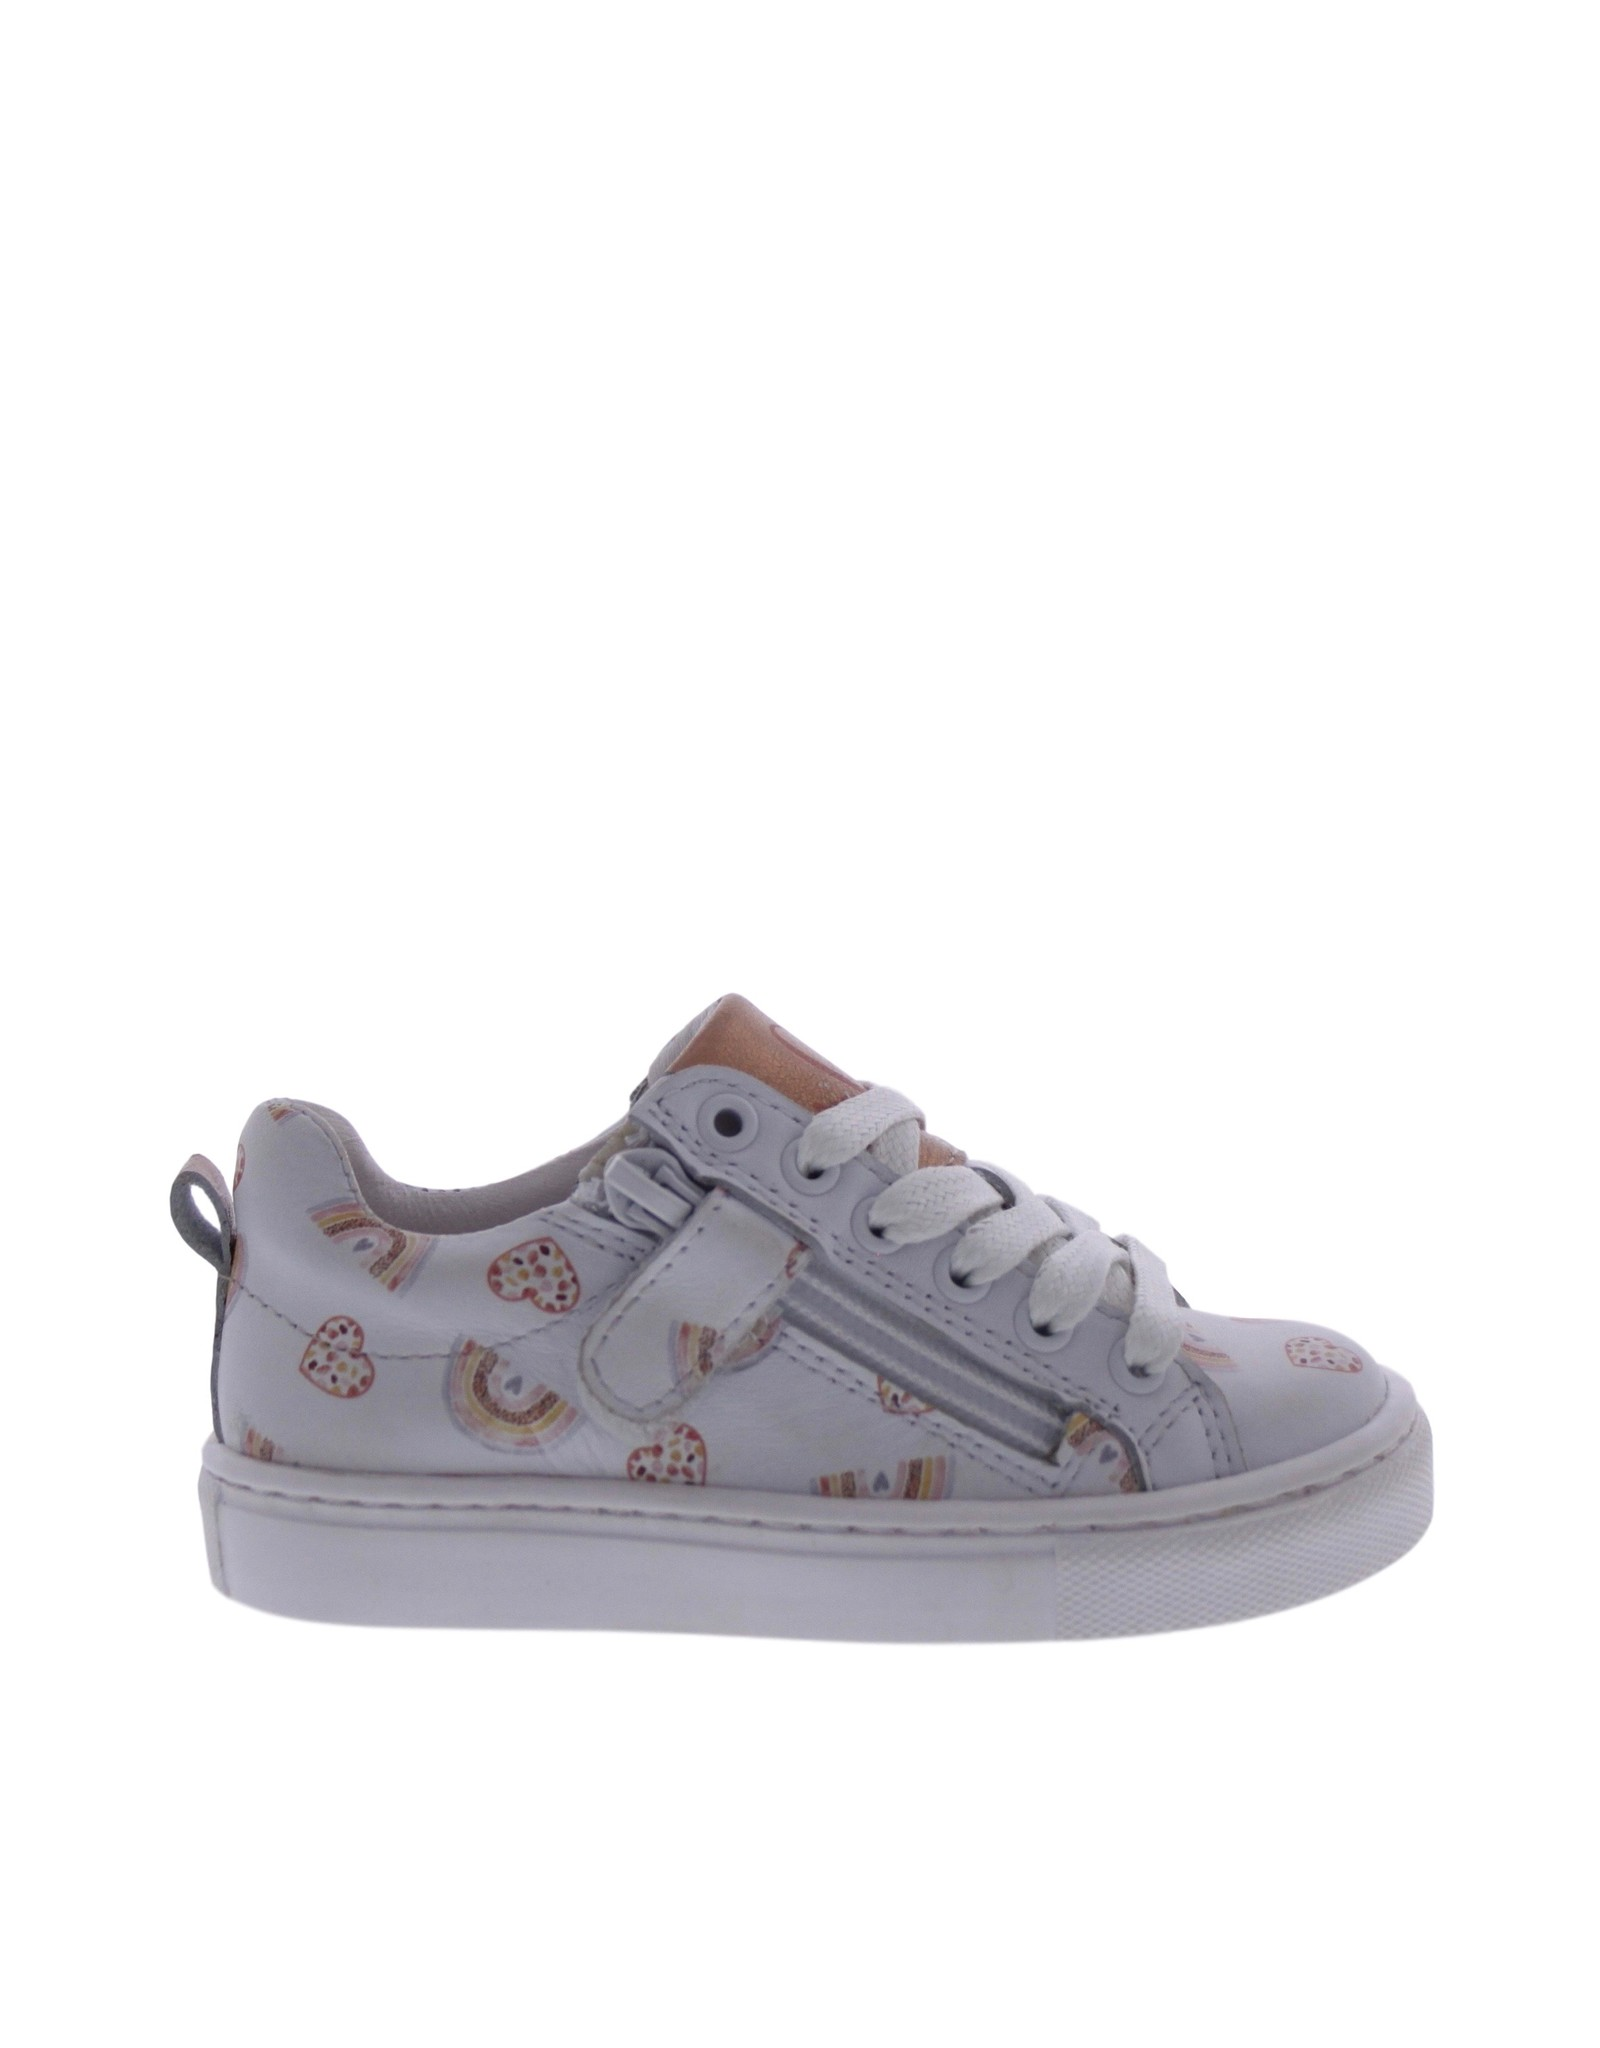 Piedro Piedro - For Jet - Witte Fantasie Sneaker